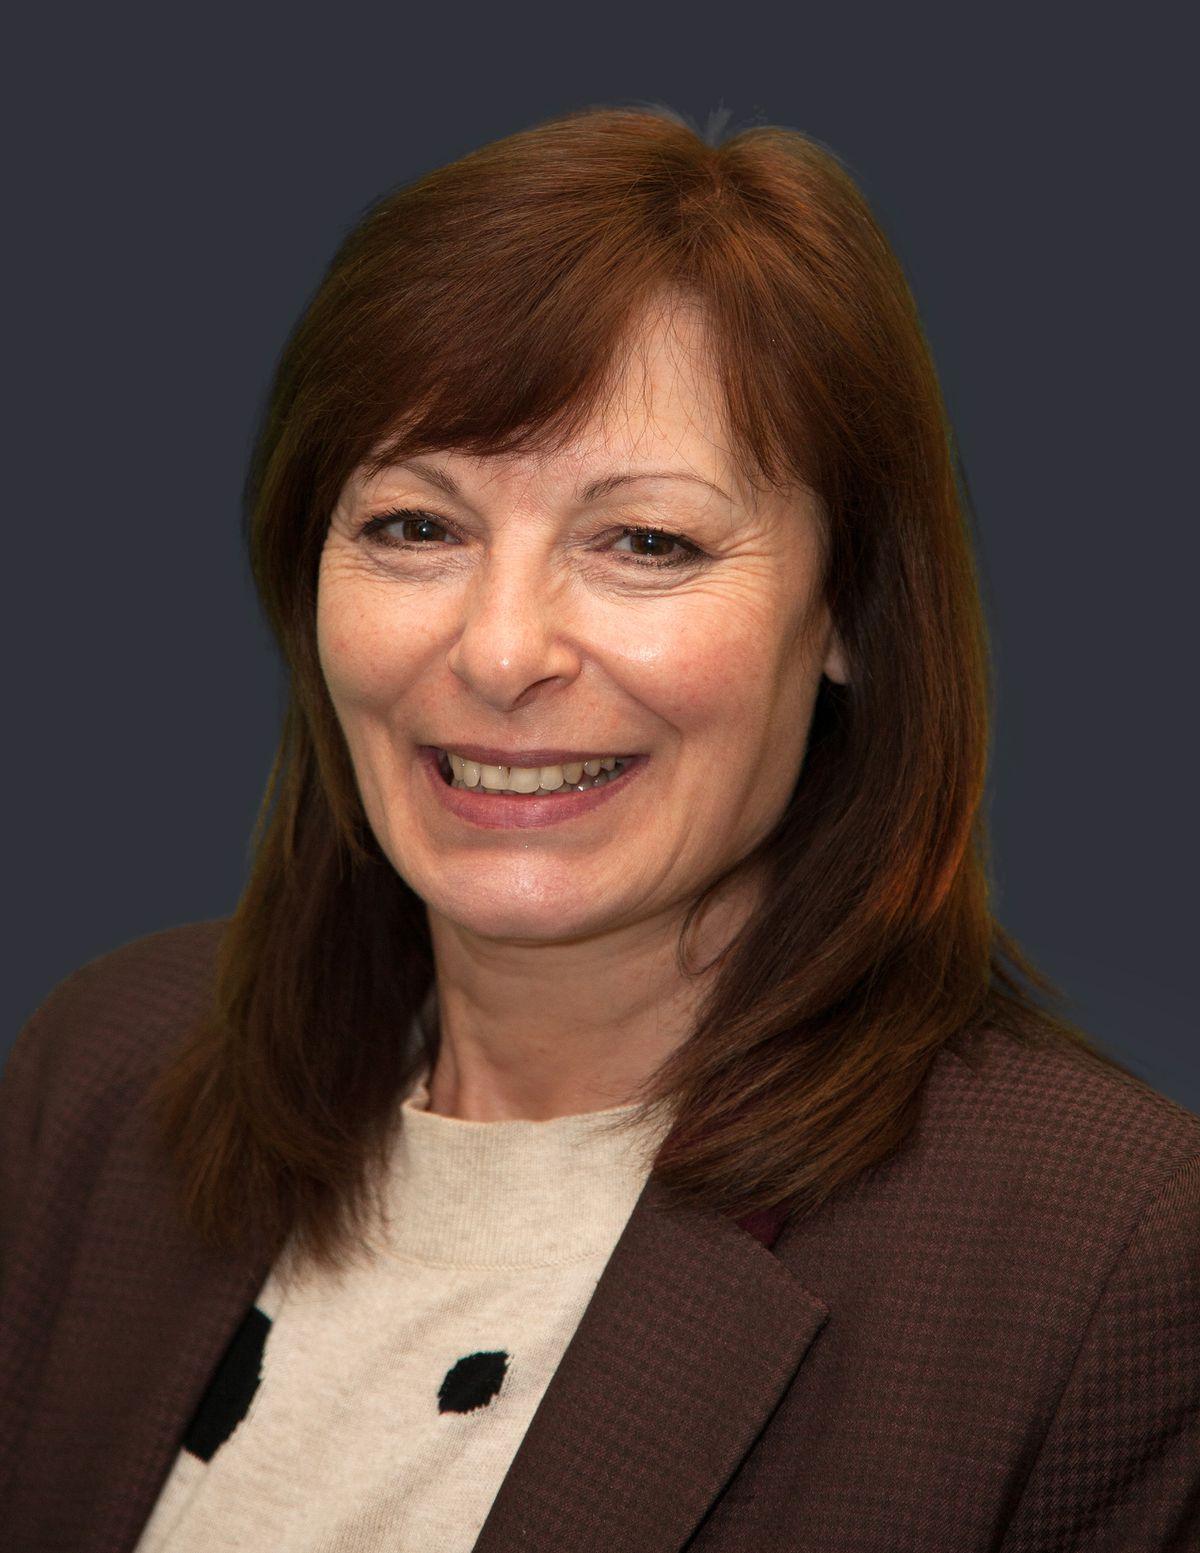 Sandwell Council leader Maria Crompton